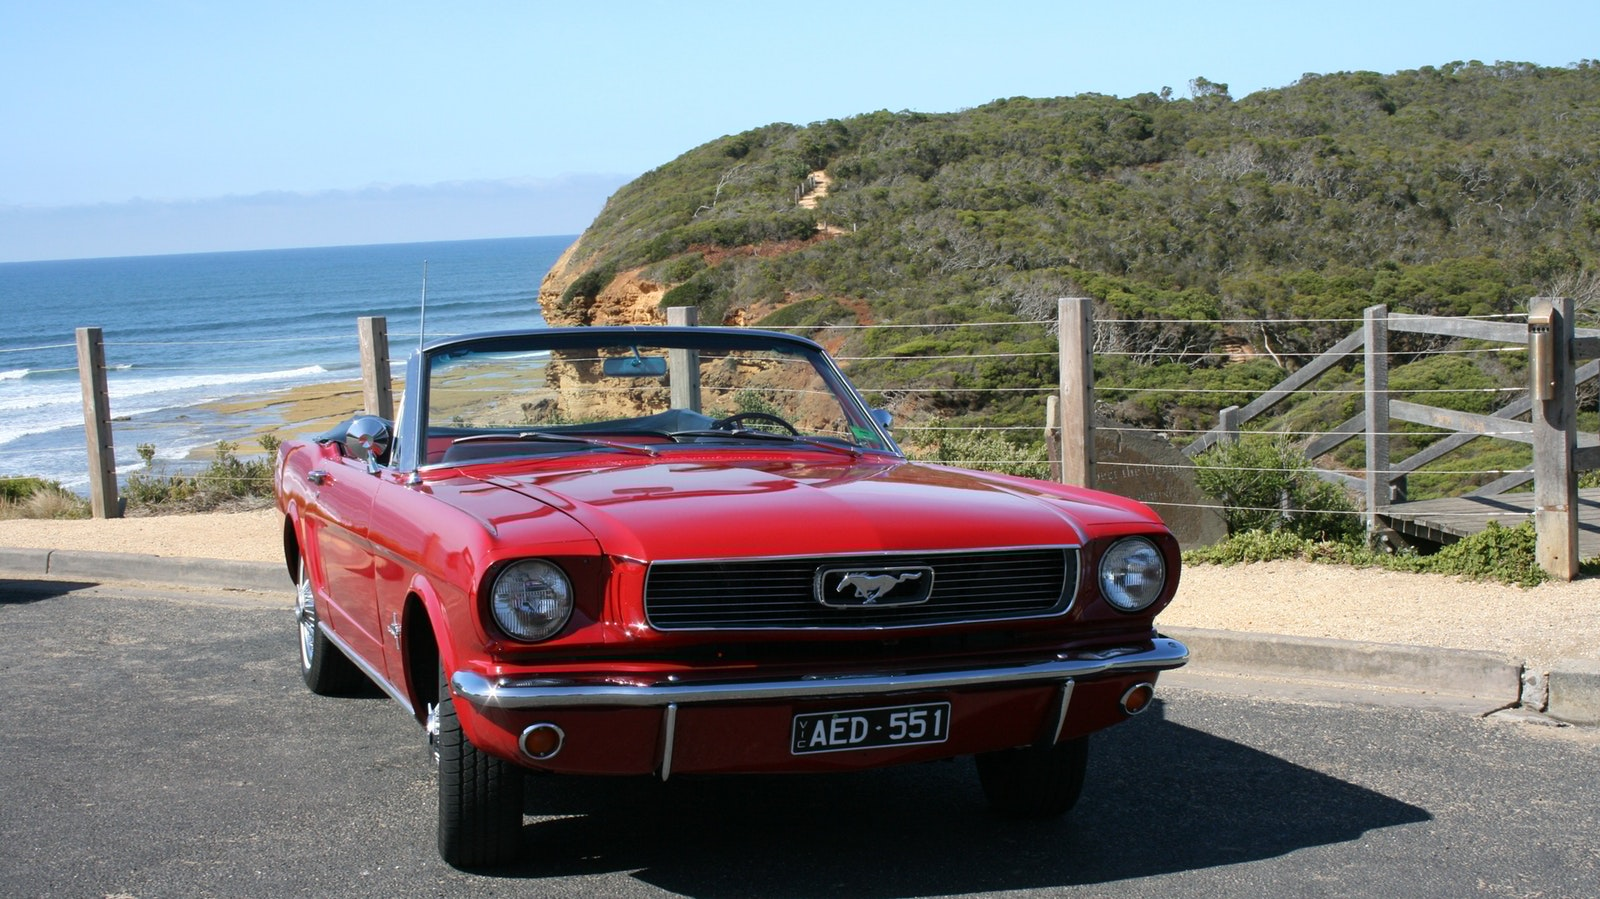 Mustang at Bells Beach